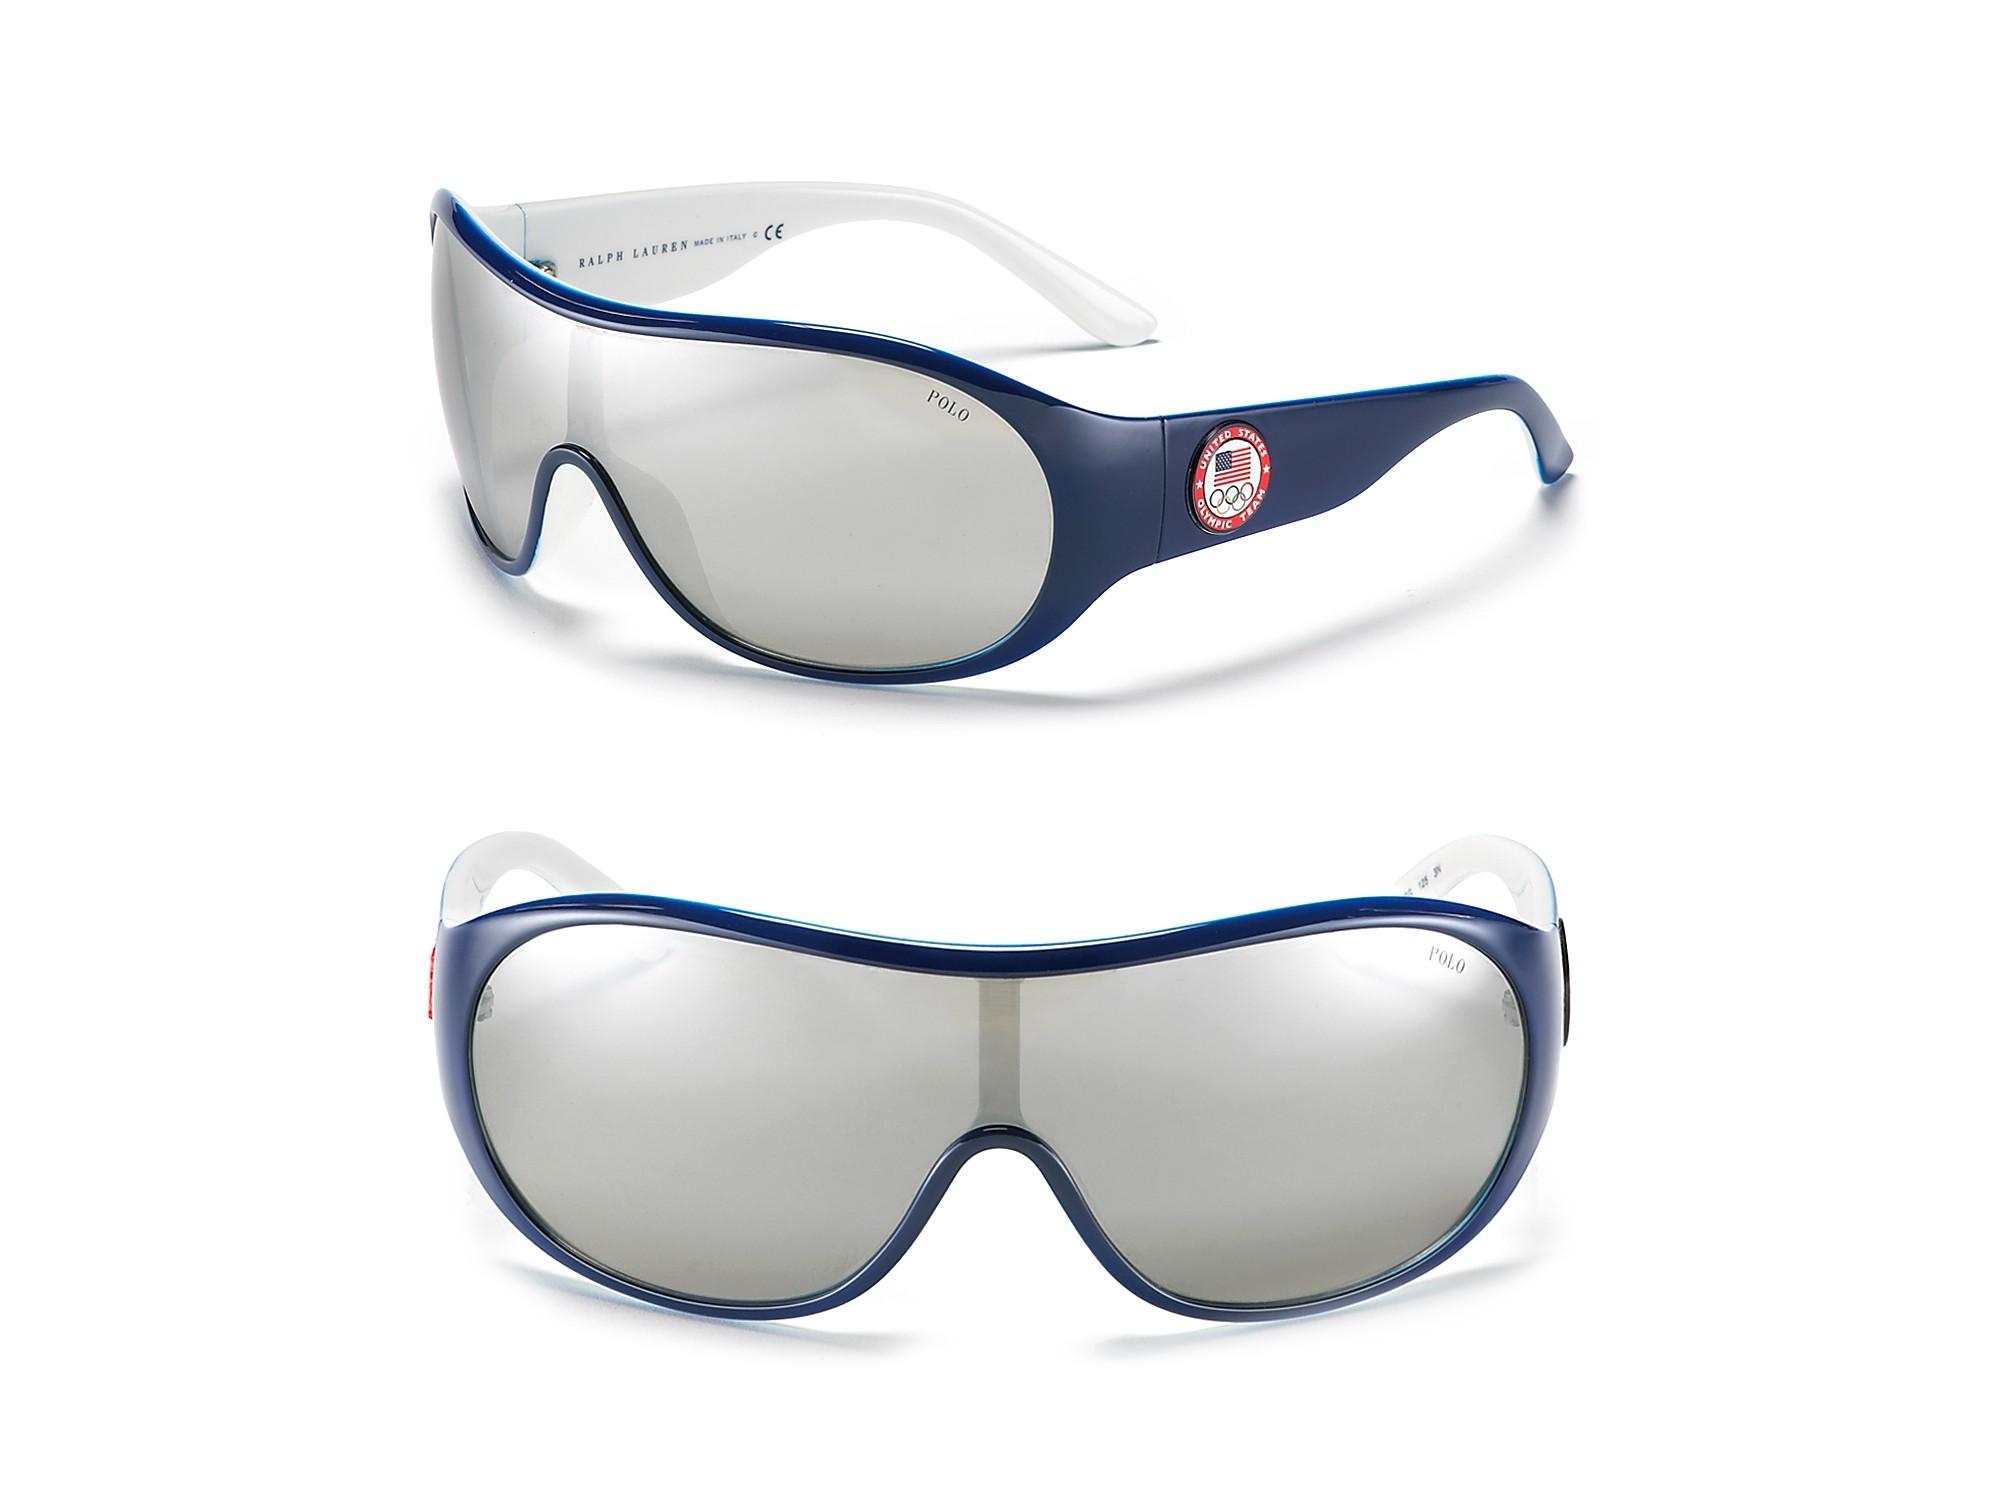 13007e87037 Lyst - Polo Ralph Lauren Olympic Shield Sunglasses in Blue for Men